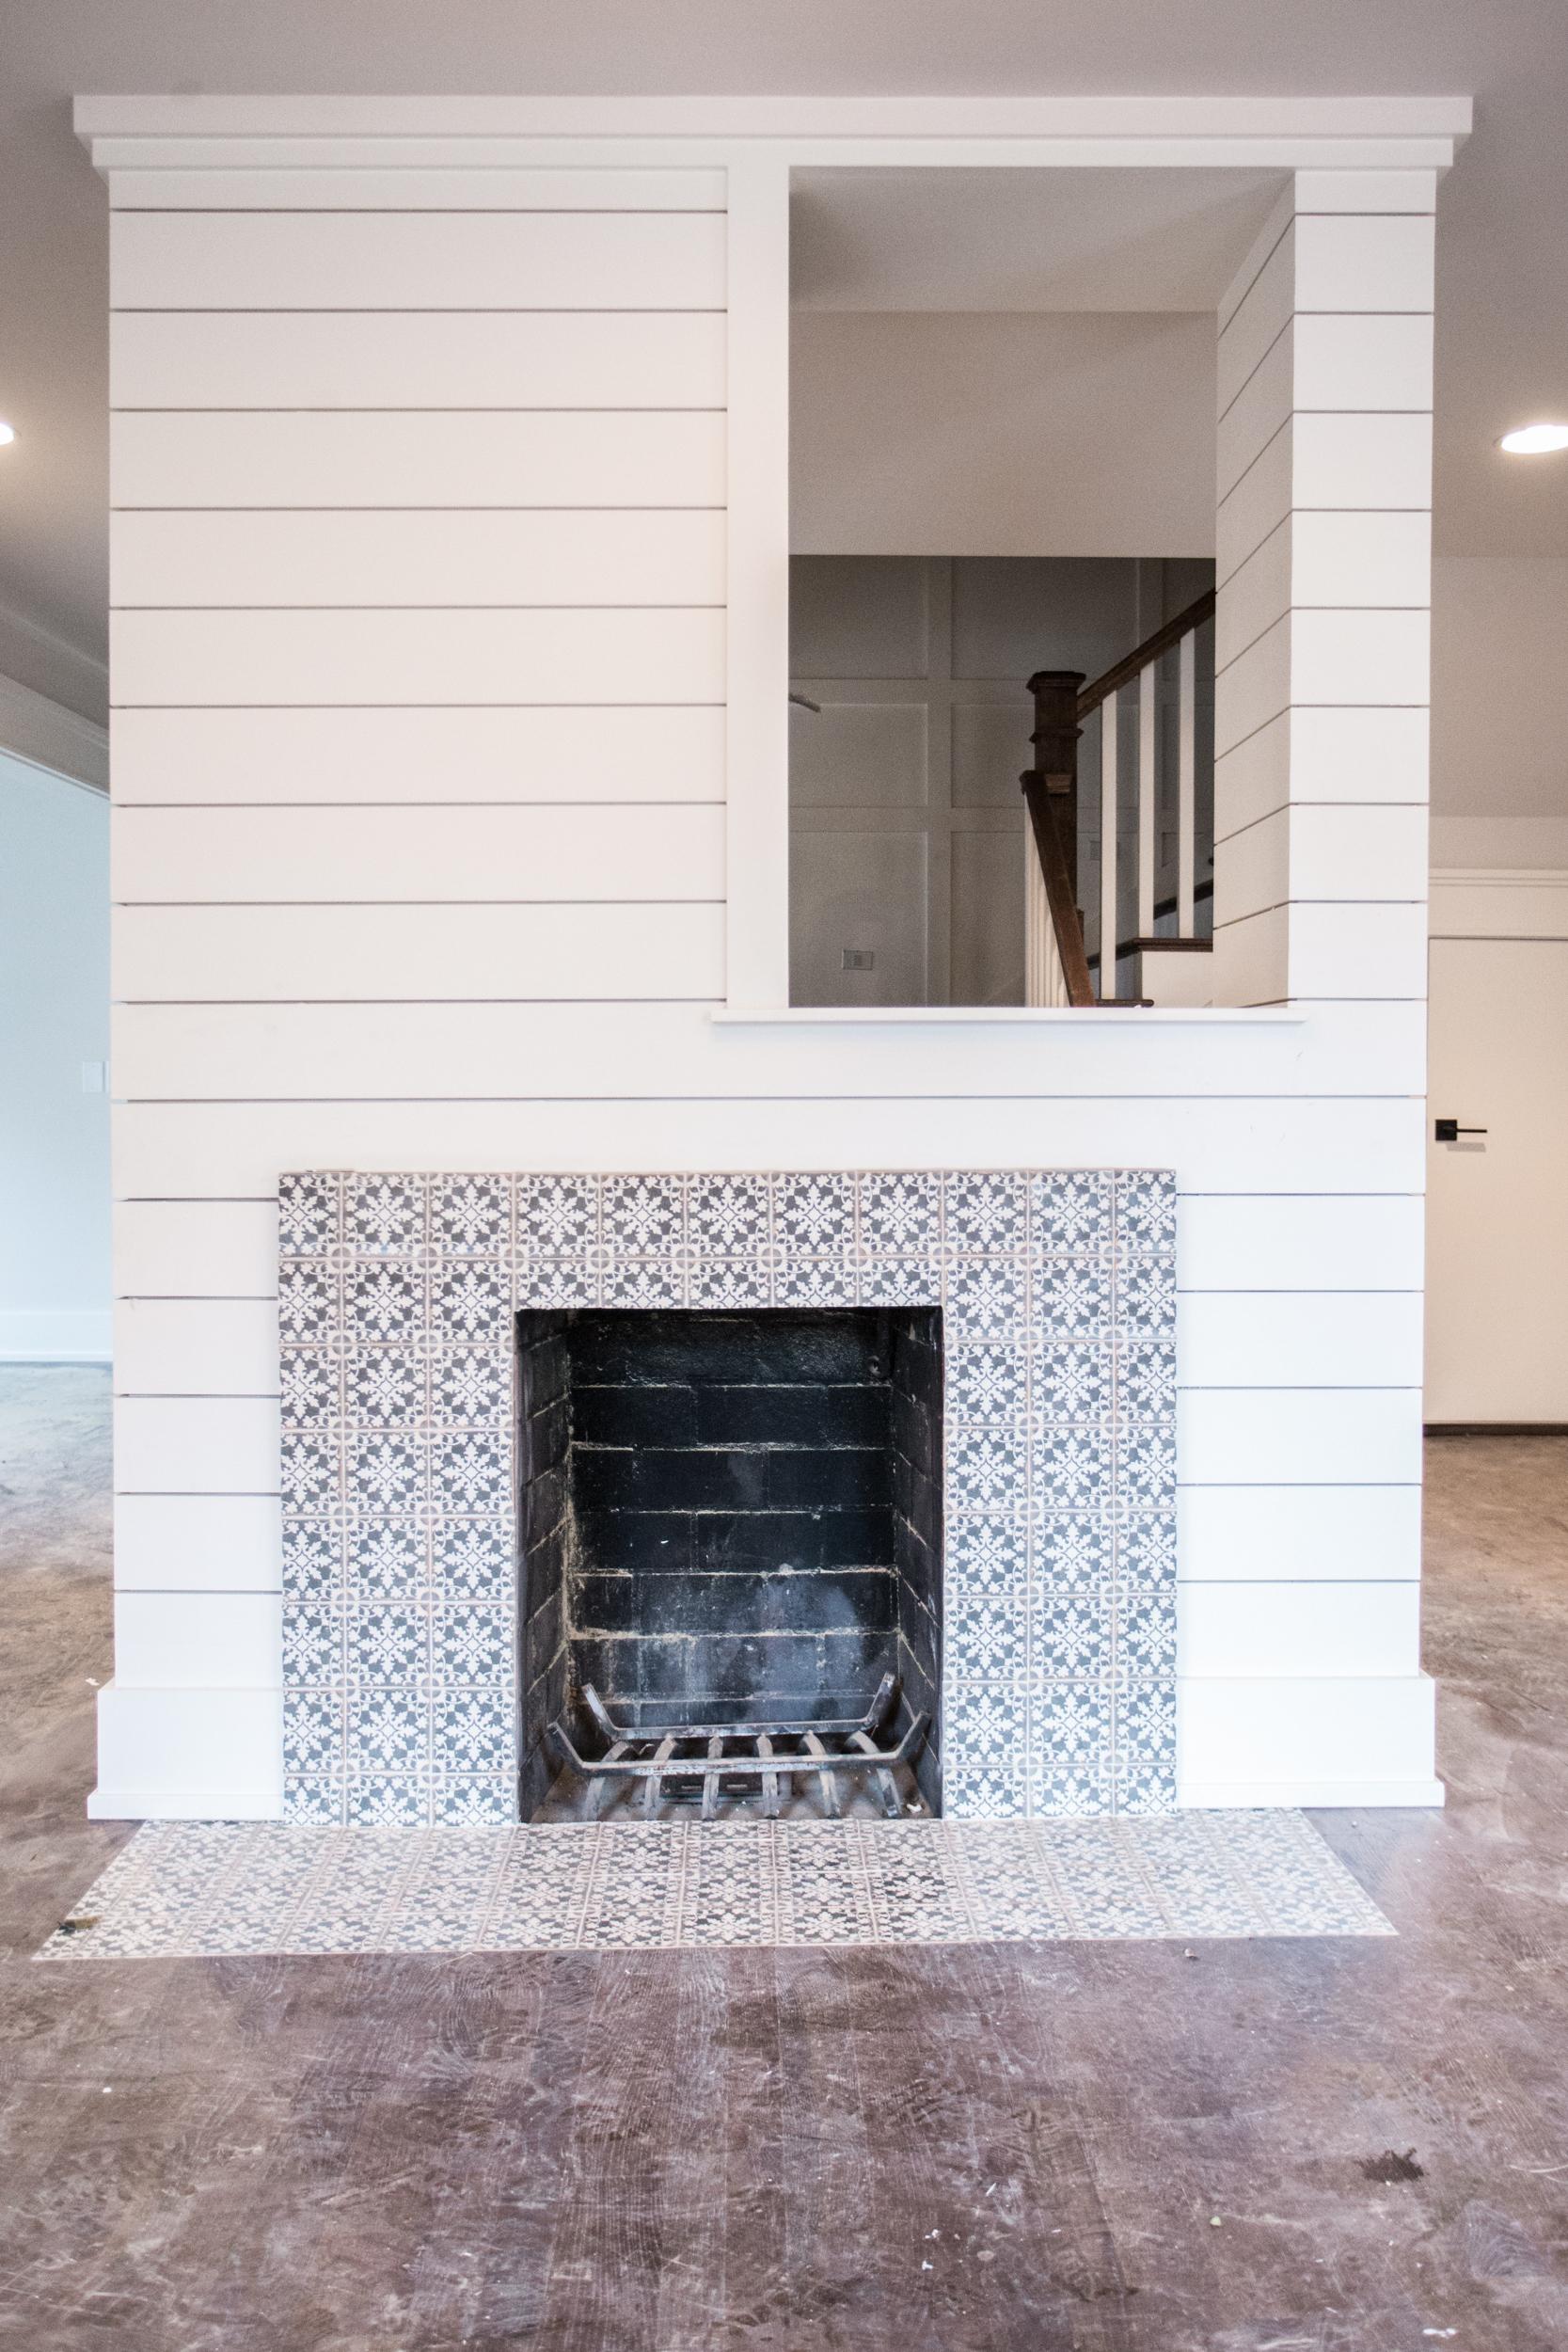 britt-development-group-nashville-tennessee-custom-home-builder-historic-restoration-0792.jpg